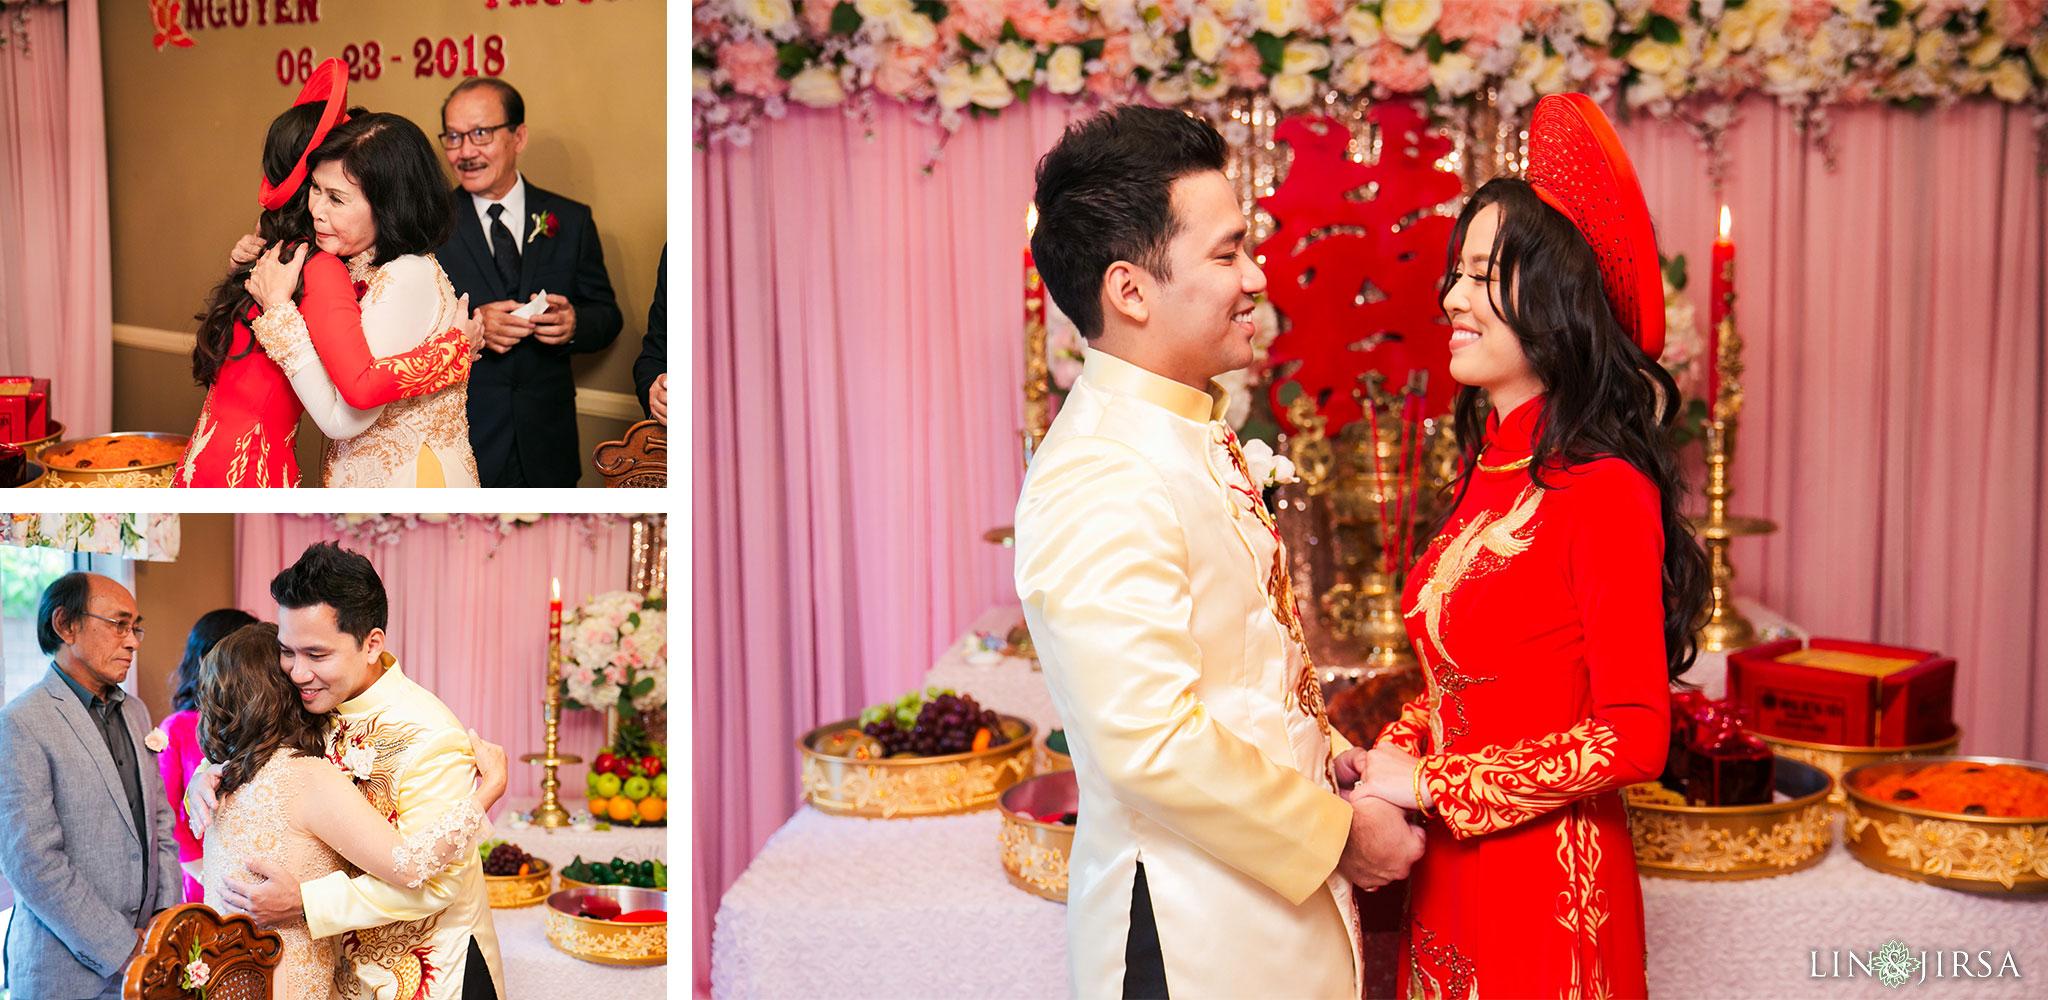 007 orange county vietnamese wedding photography